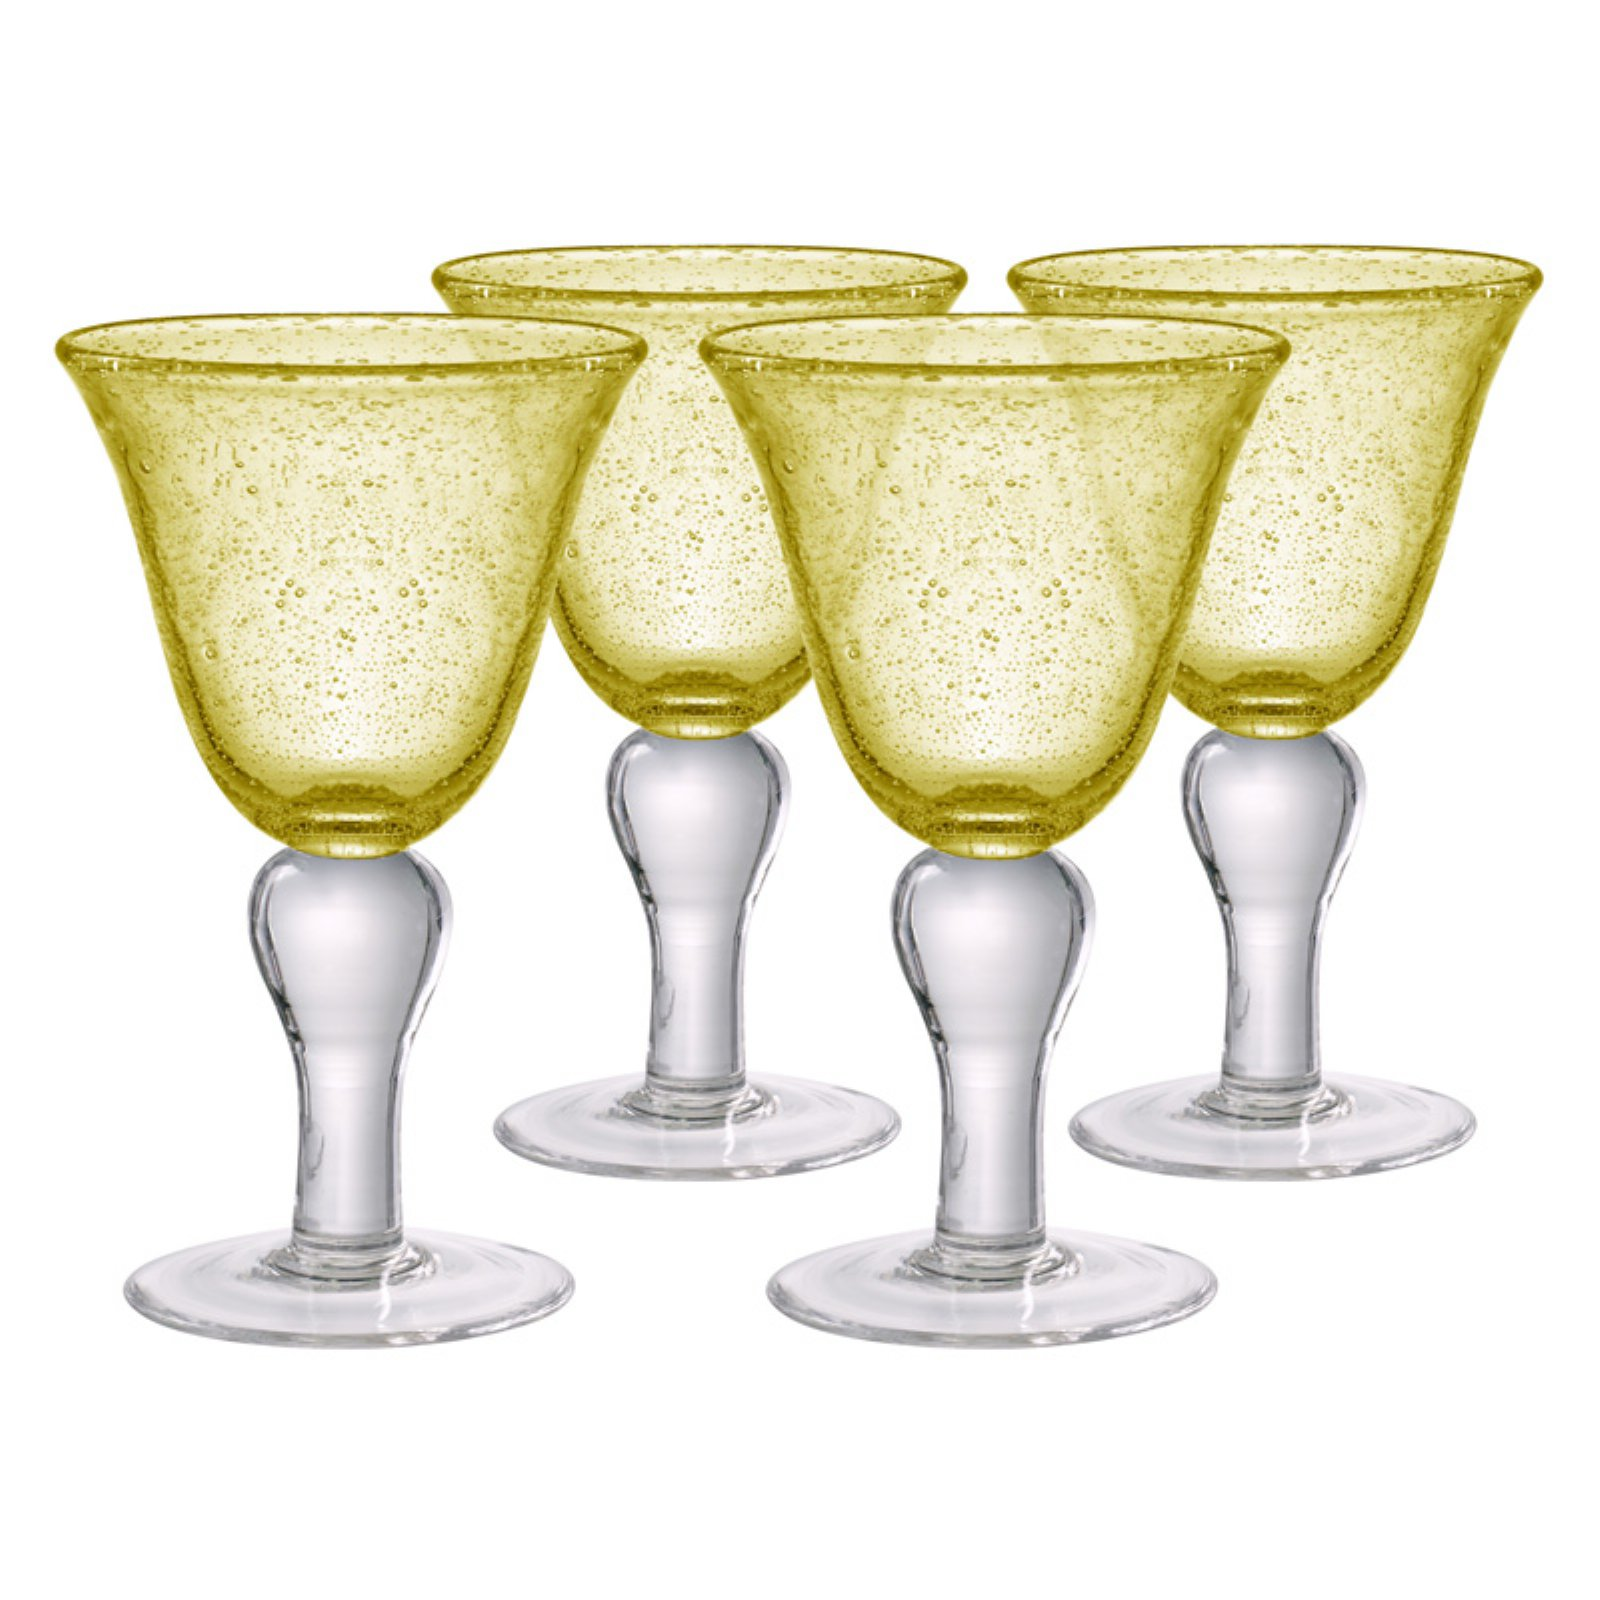 Artland Iris Wine Glass Set of 4 by Artland